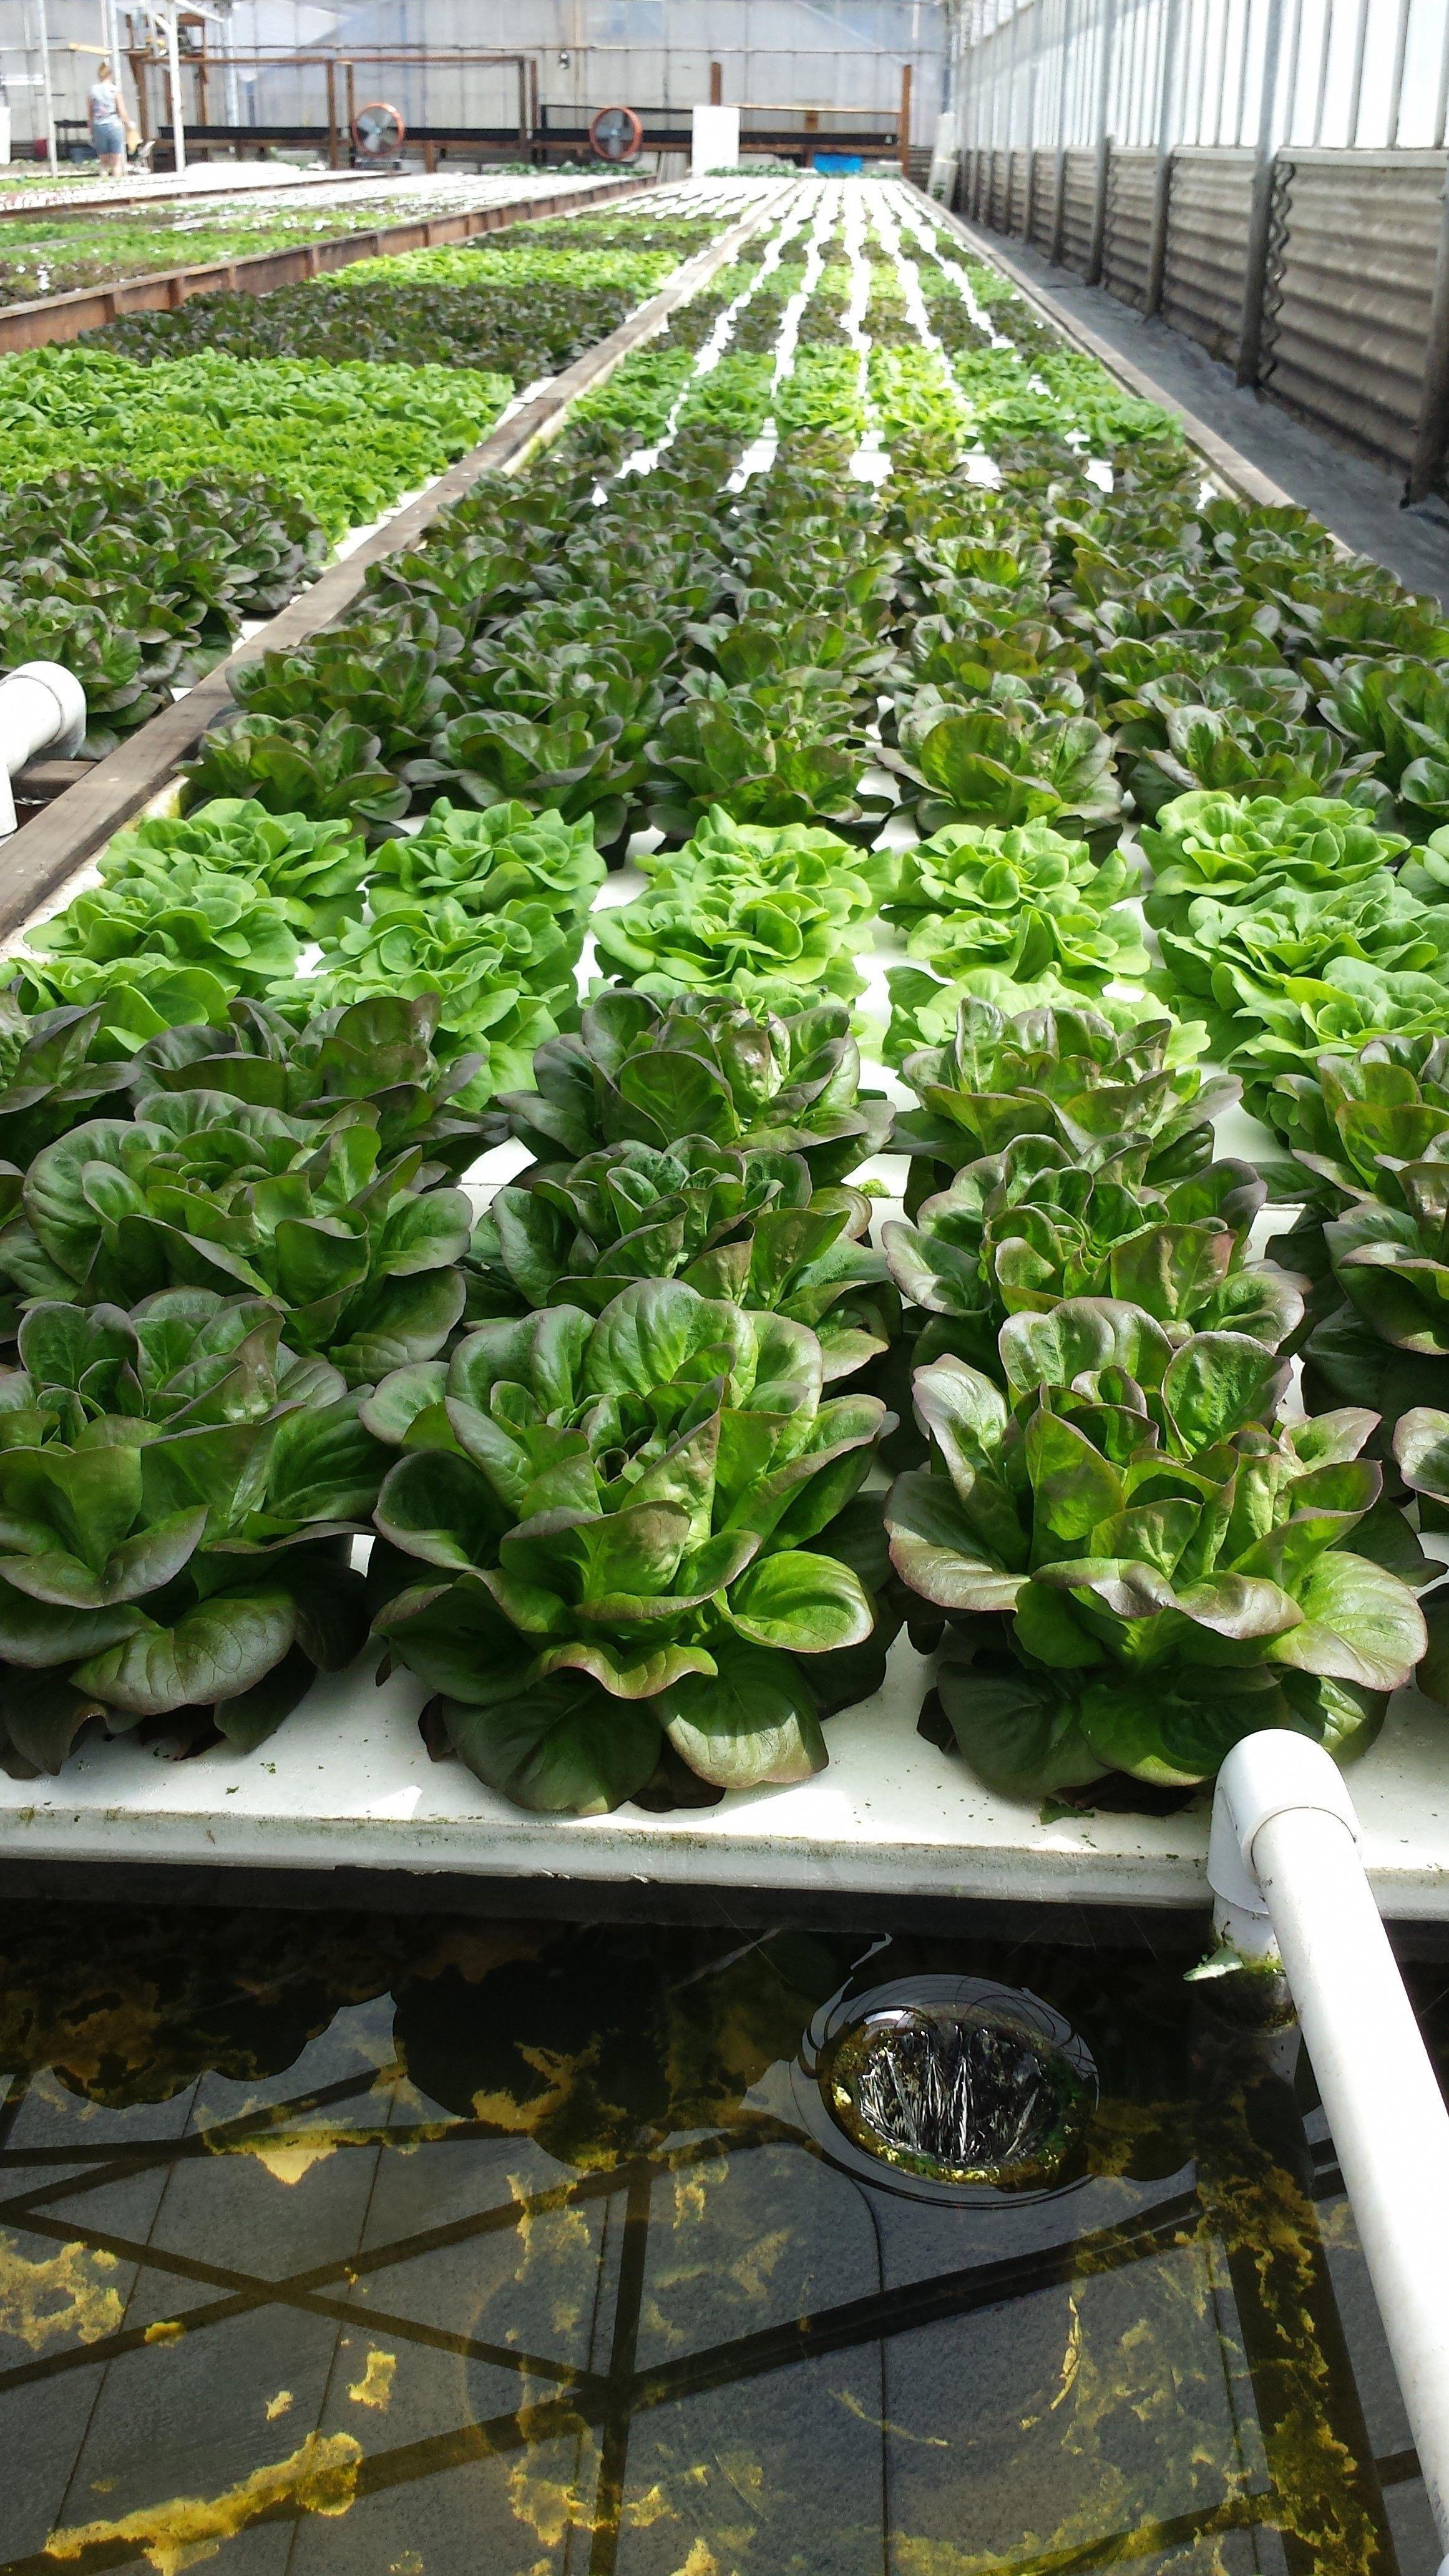 Various Varieties Of Lettuce In The Dwc Grow Beds At Ouroboros Aquaponic Farm In Half Moon Bay Ca See Aquaponics Greenhouse Aquaponics System Aquaponics Fish